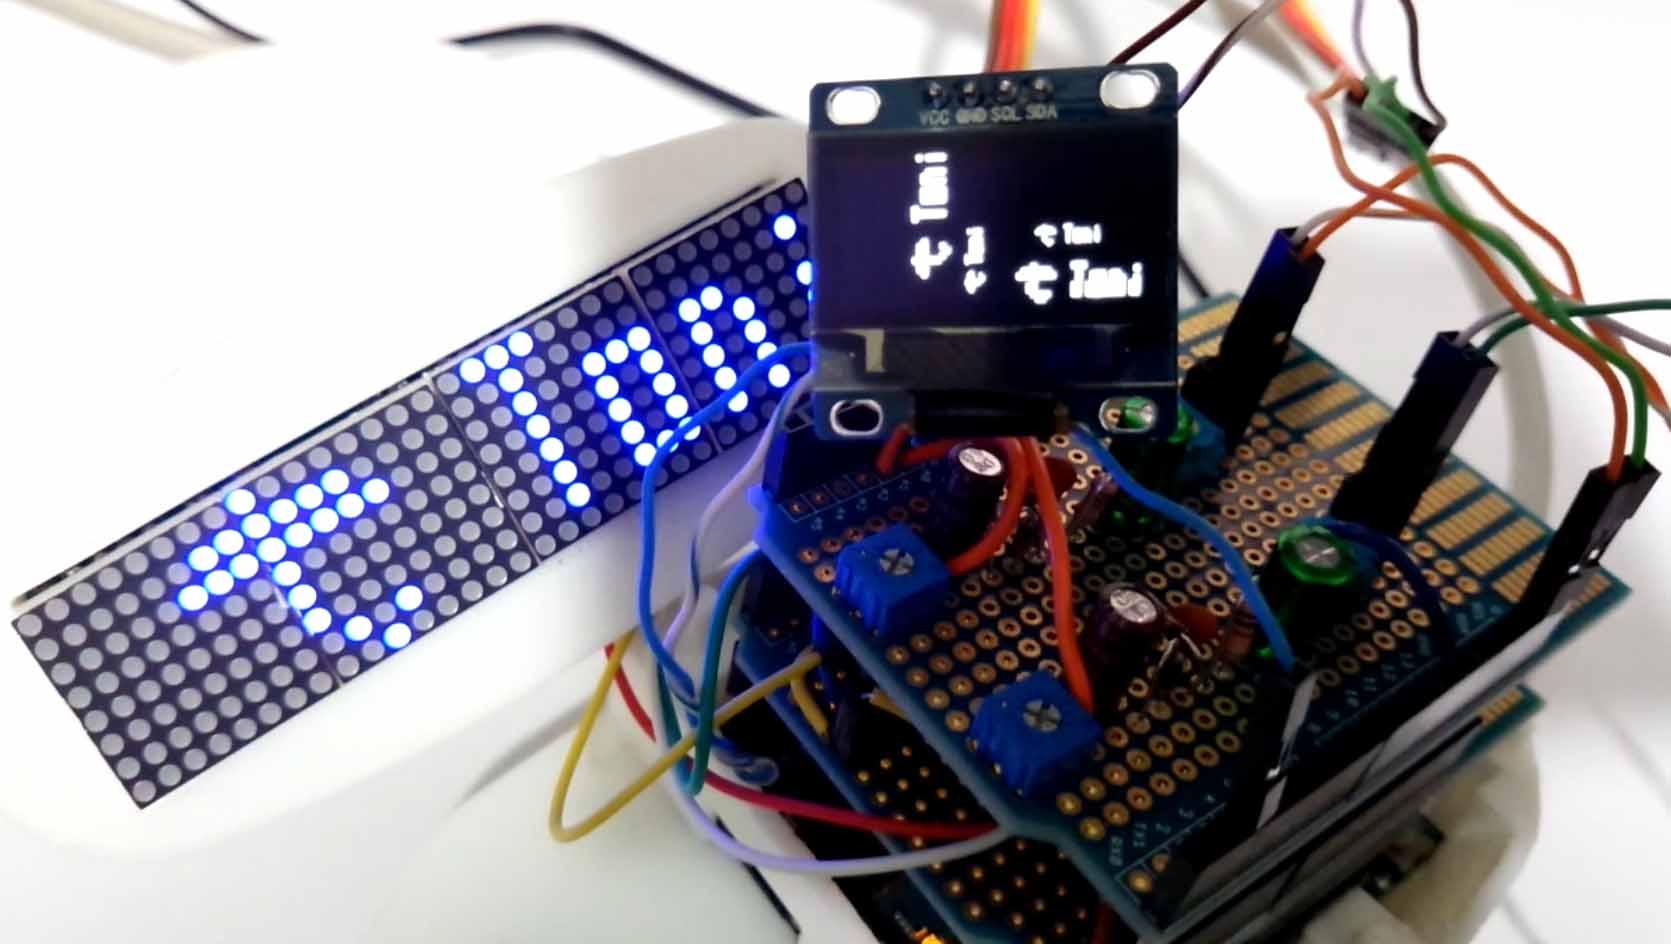 I2C極小OLED(有機EL)SSD1306に気象庁の天気予報を表示する実験